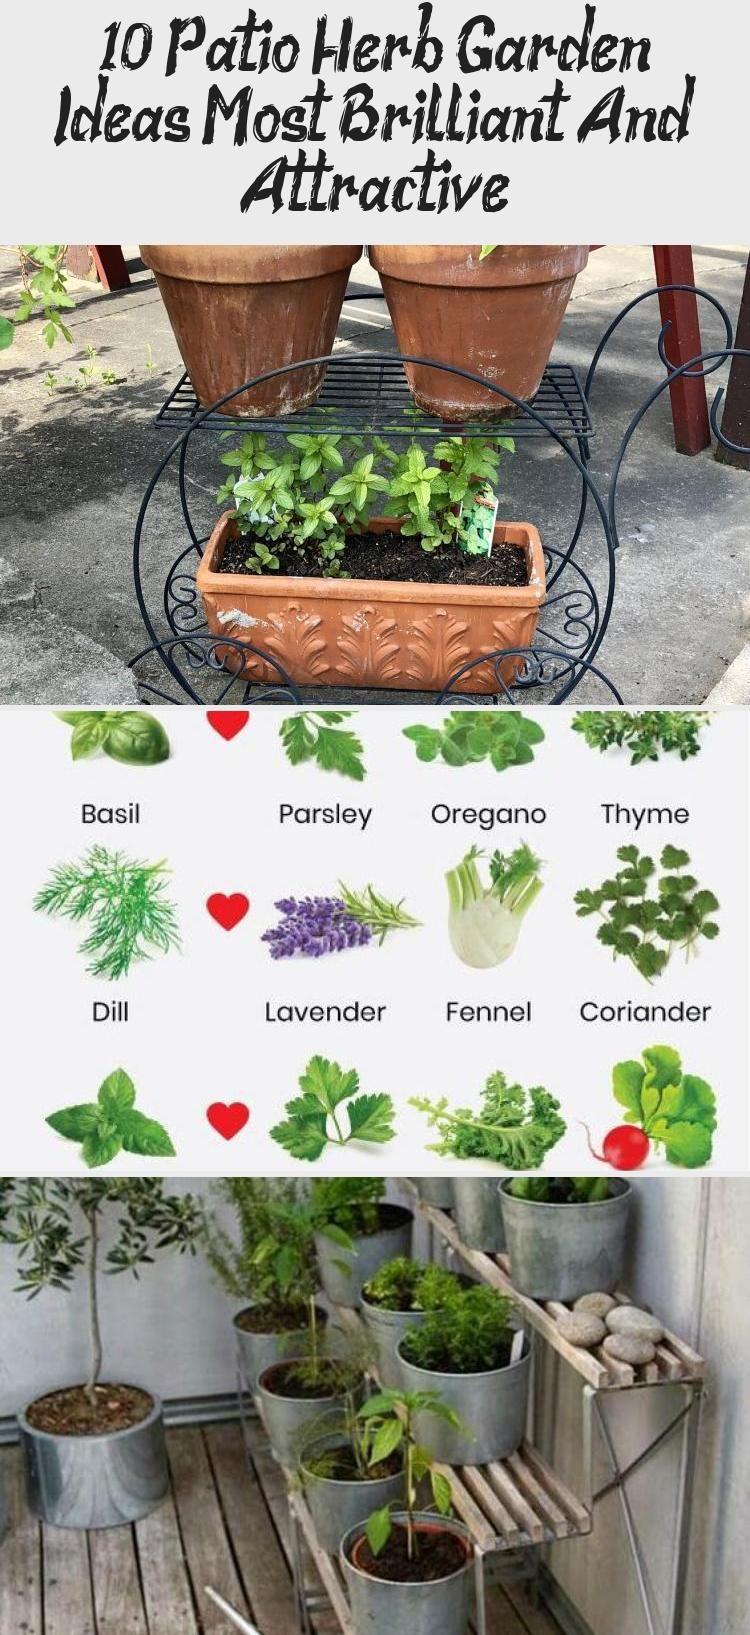 10 Patio Herb Garden Ideas Most Brilliant And Attractive In 2020